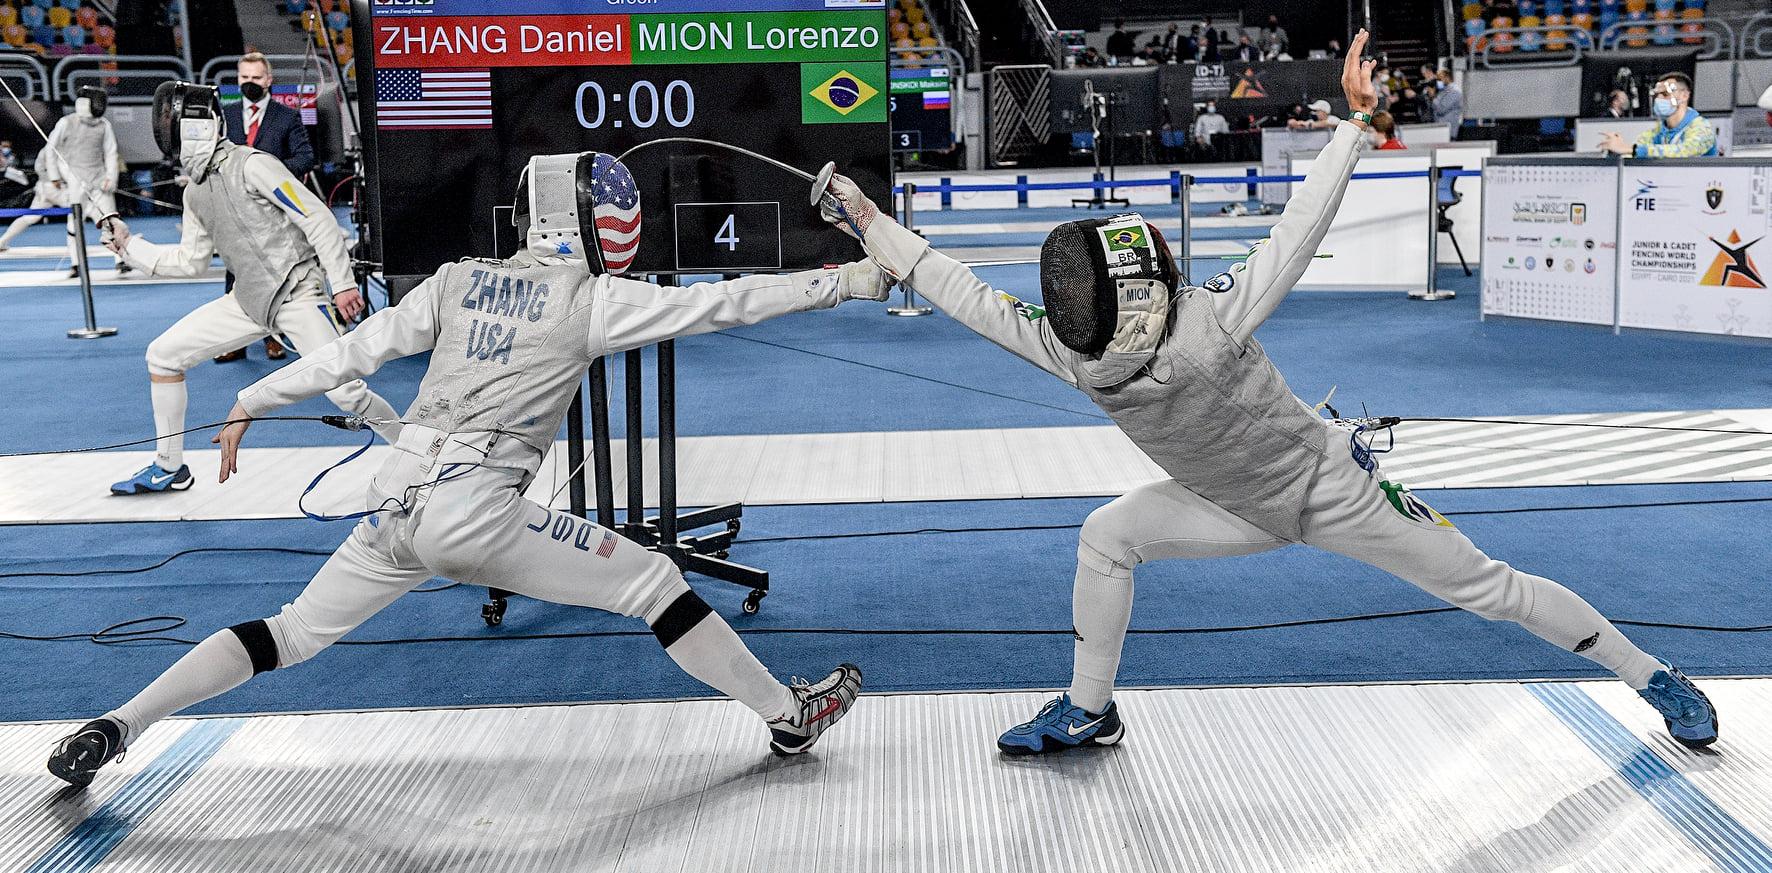 brasileiro mundial de esgrima Daniel Zhang Lorenzo Mion fencing brazil world championships